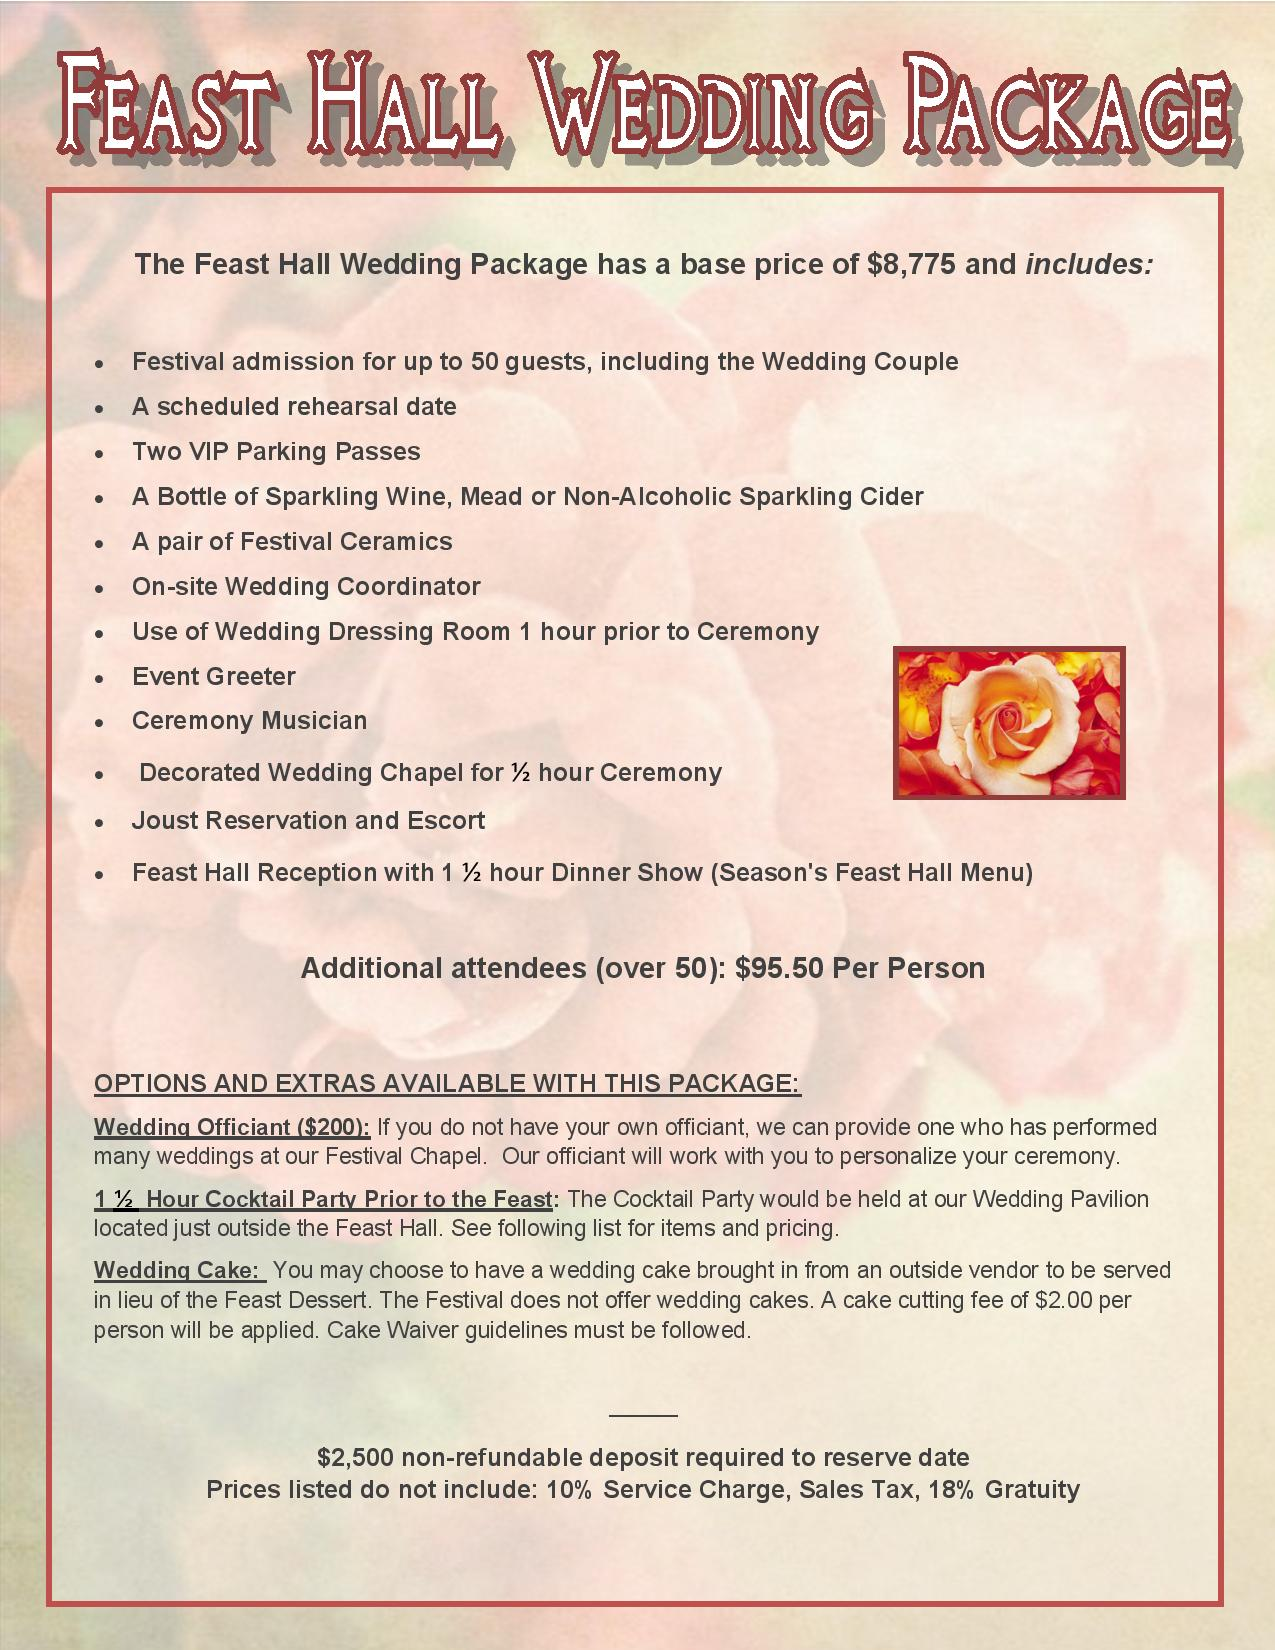 Feast Hall Wedding Package Snapshot